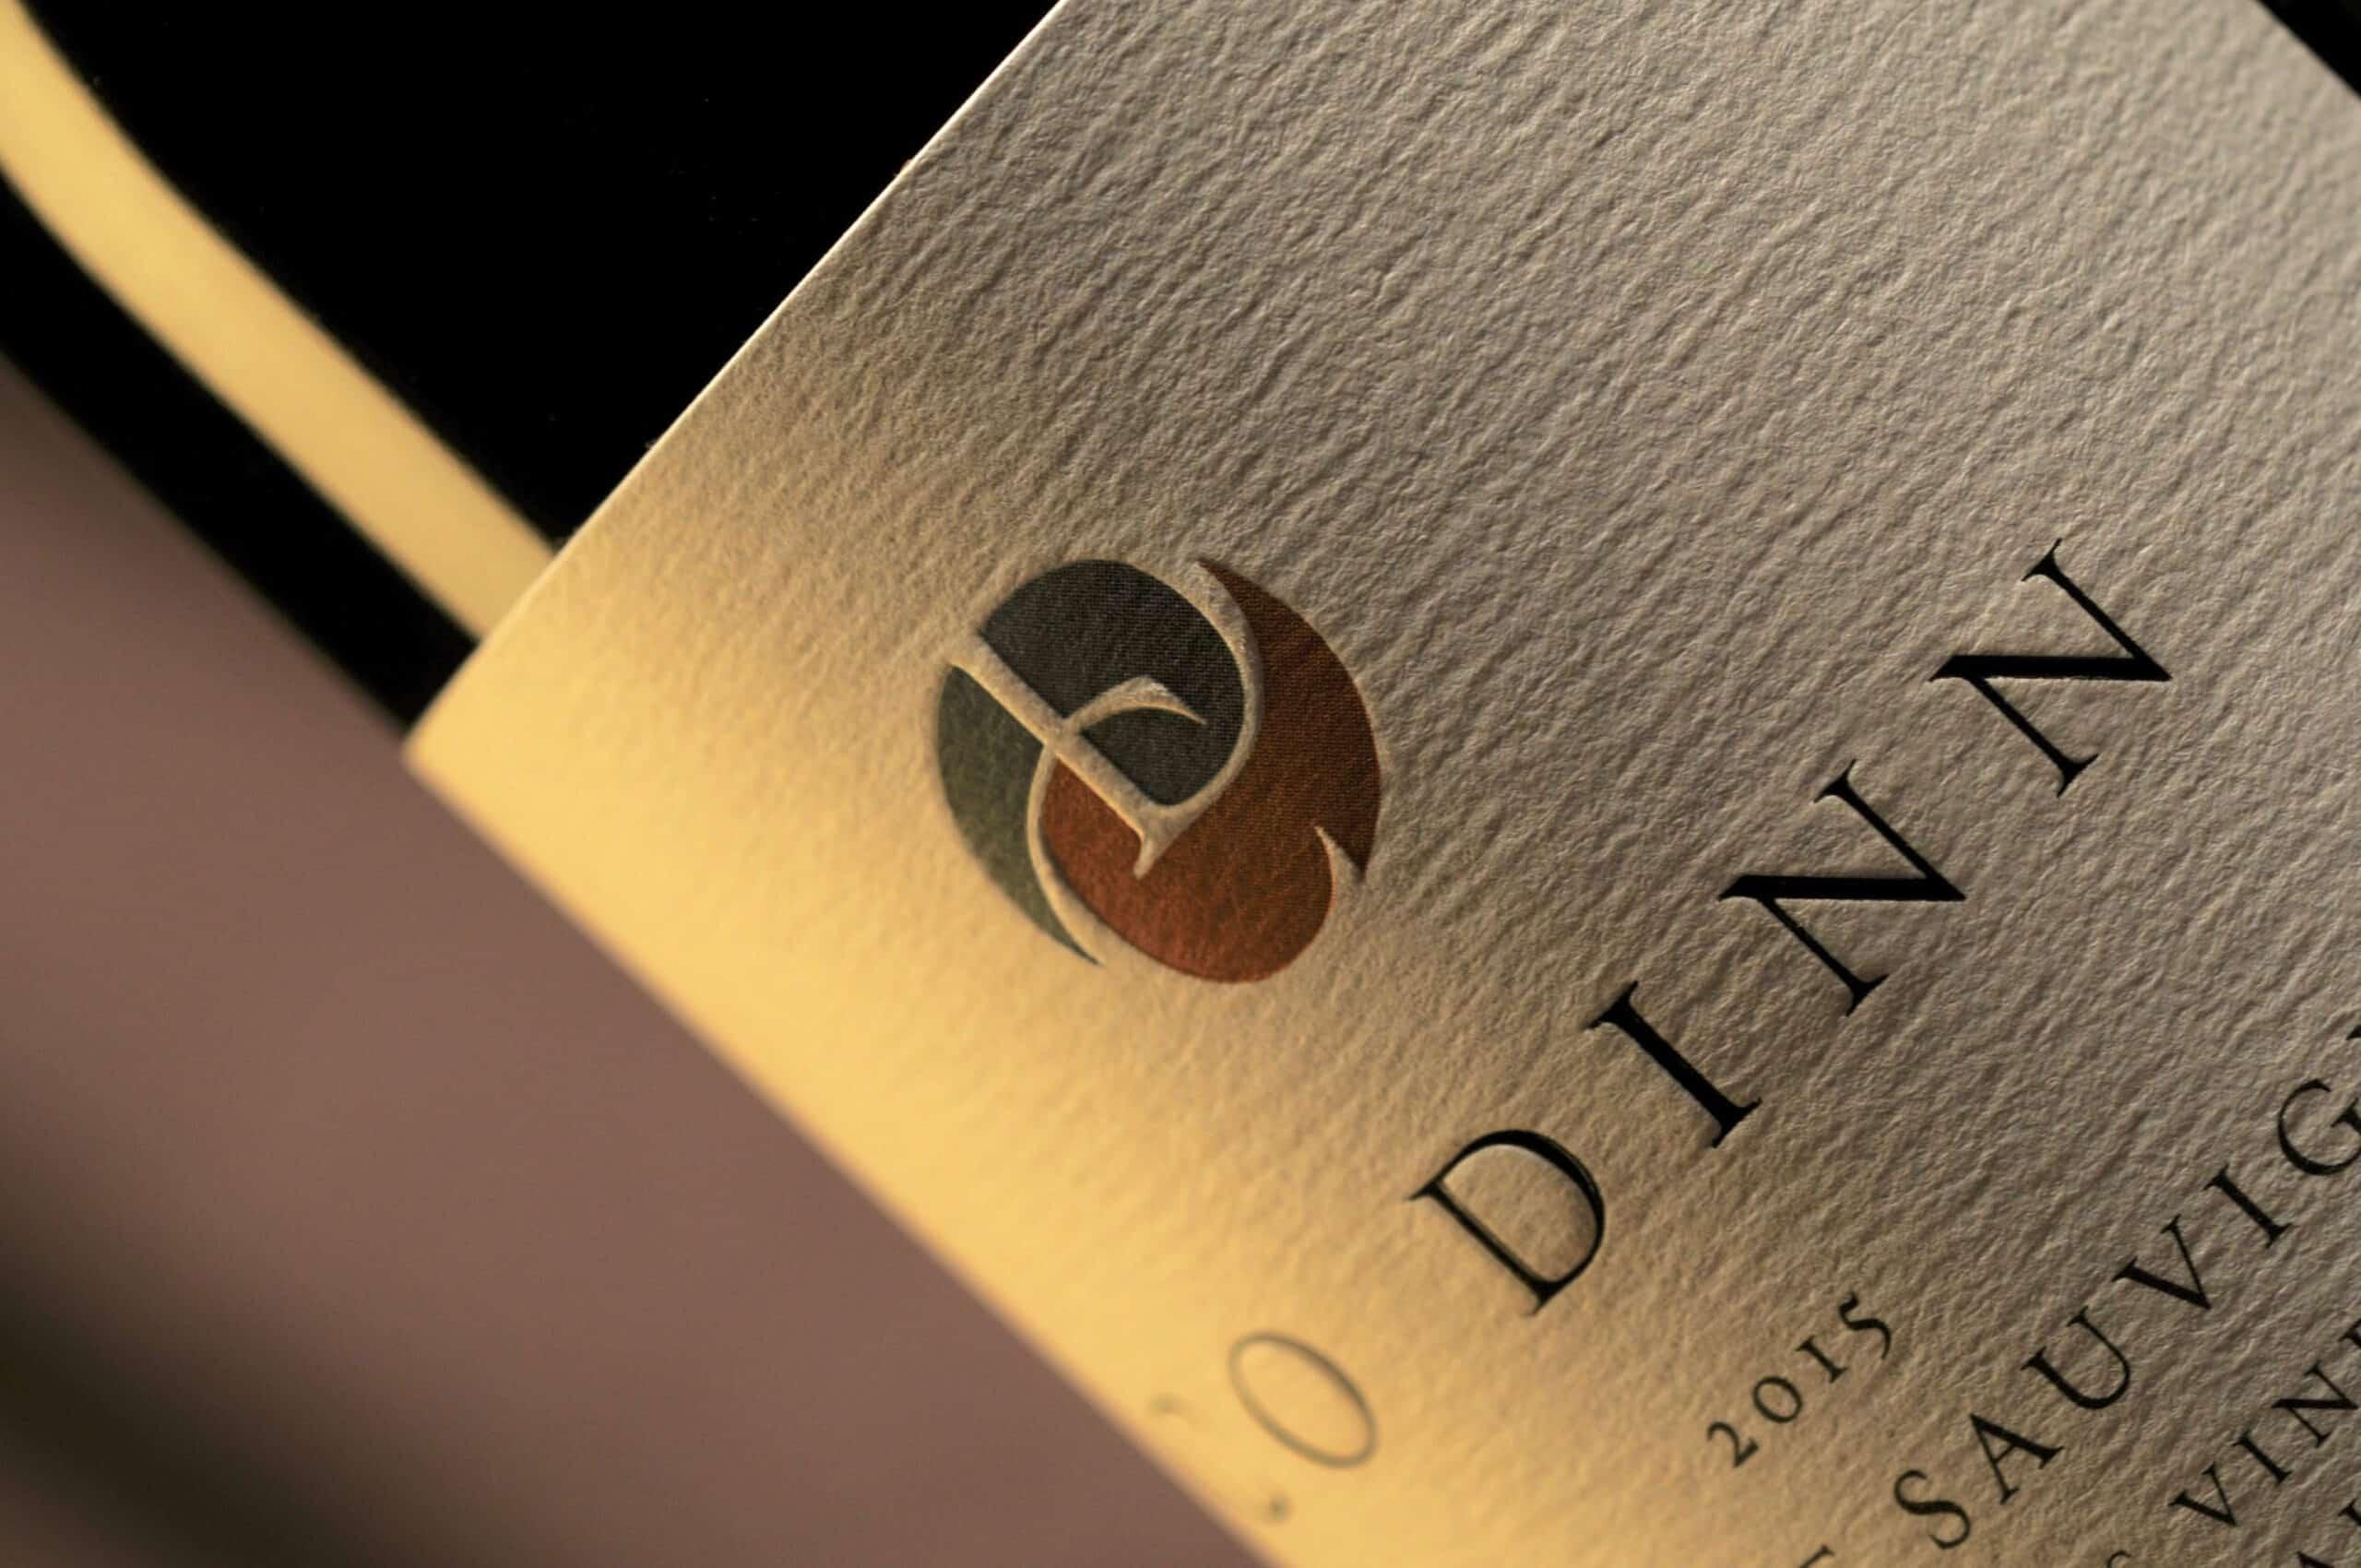 Co Dinn Cellars wine label